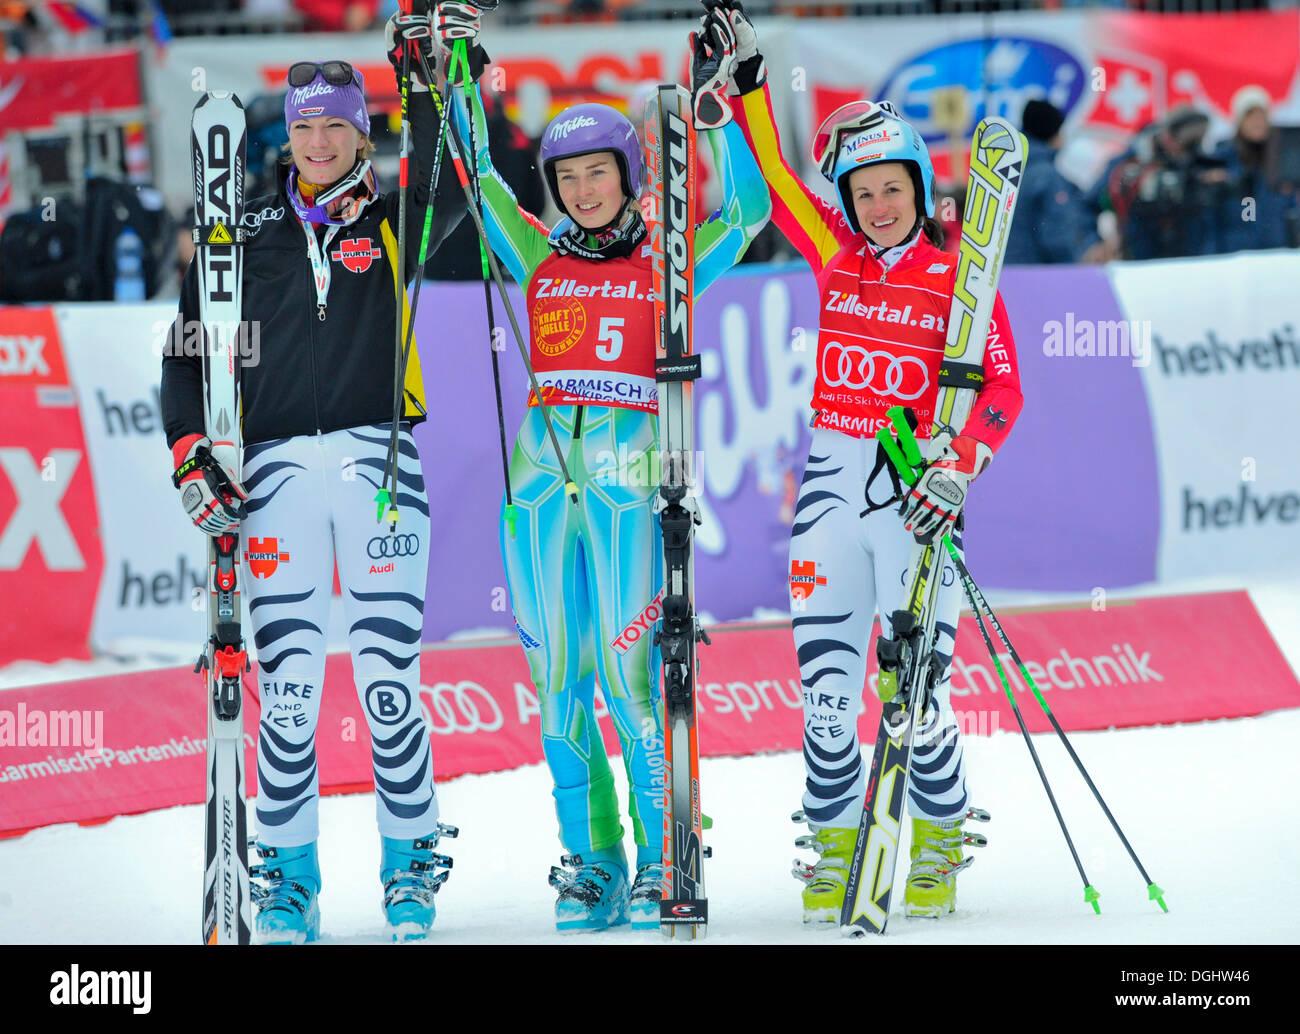 Tina Maze, Maria Riesch, Kathrin Hoelzl, Ski World Cup, Garmisch-Partenkirchen, Bavaria - Stock Image